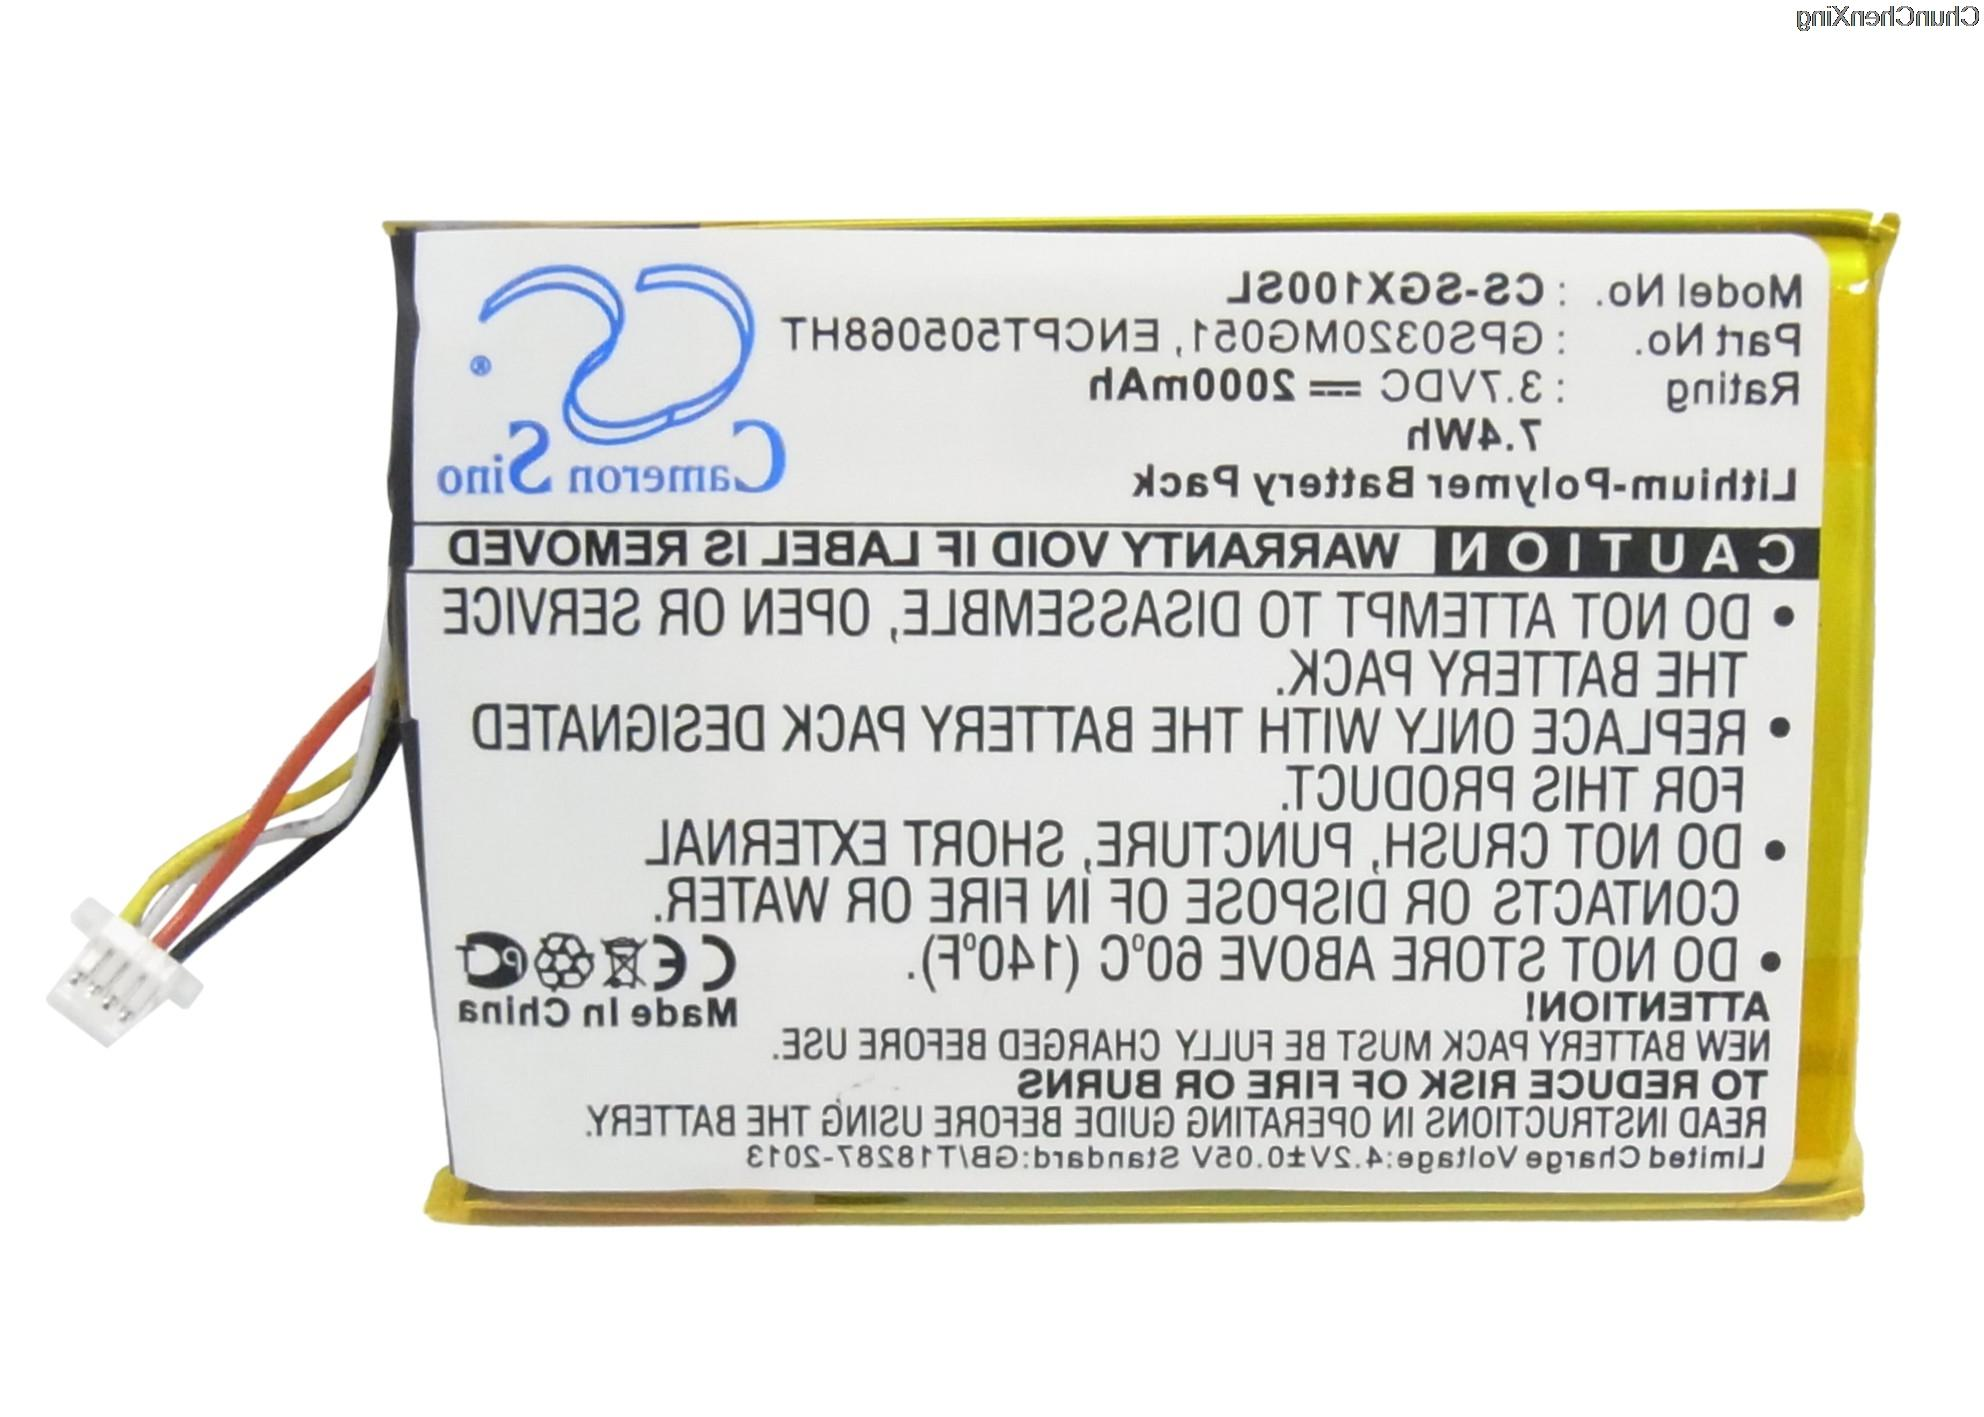 2000mah battery gps0320mg051 for skygolf skycaddie sgx